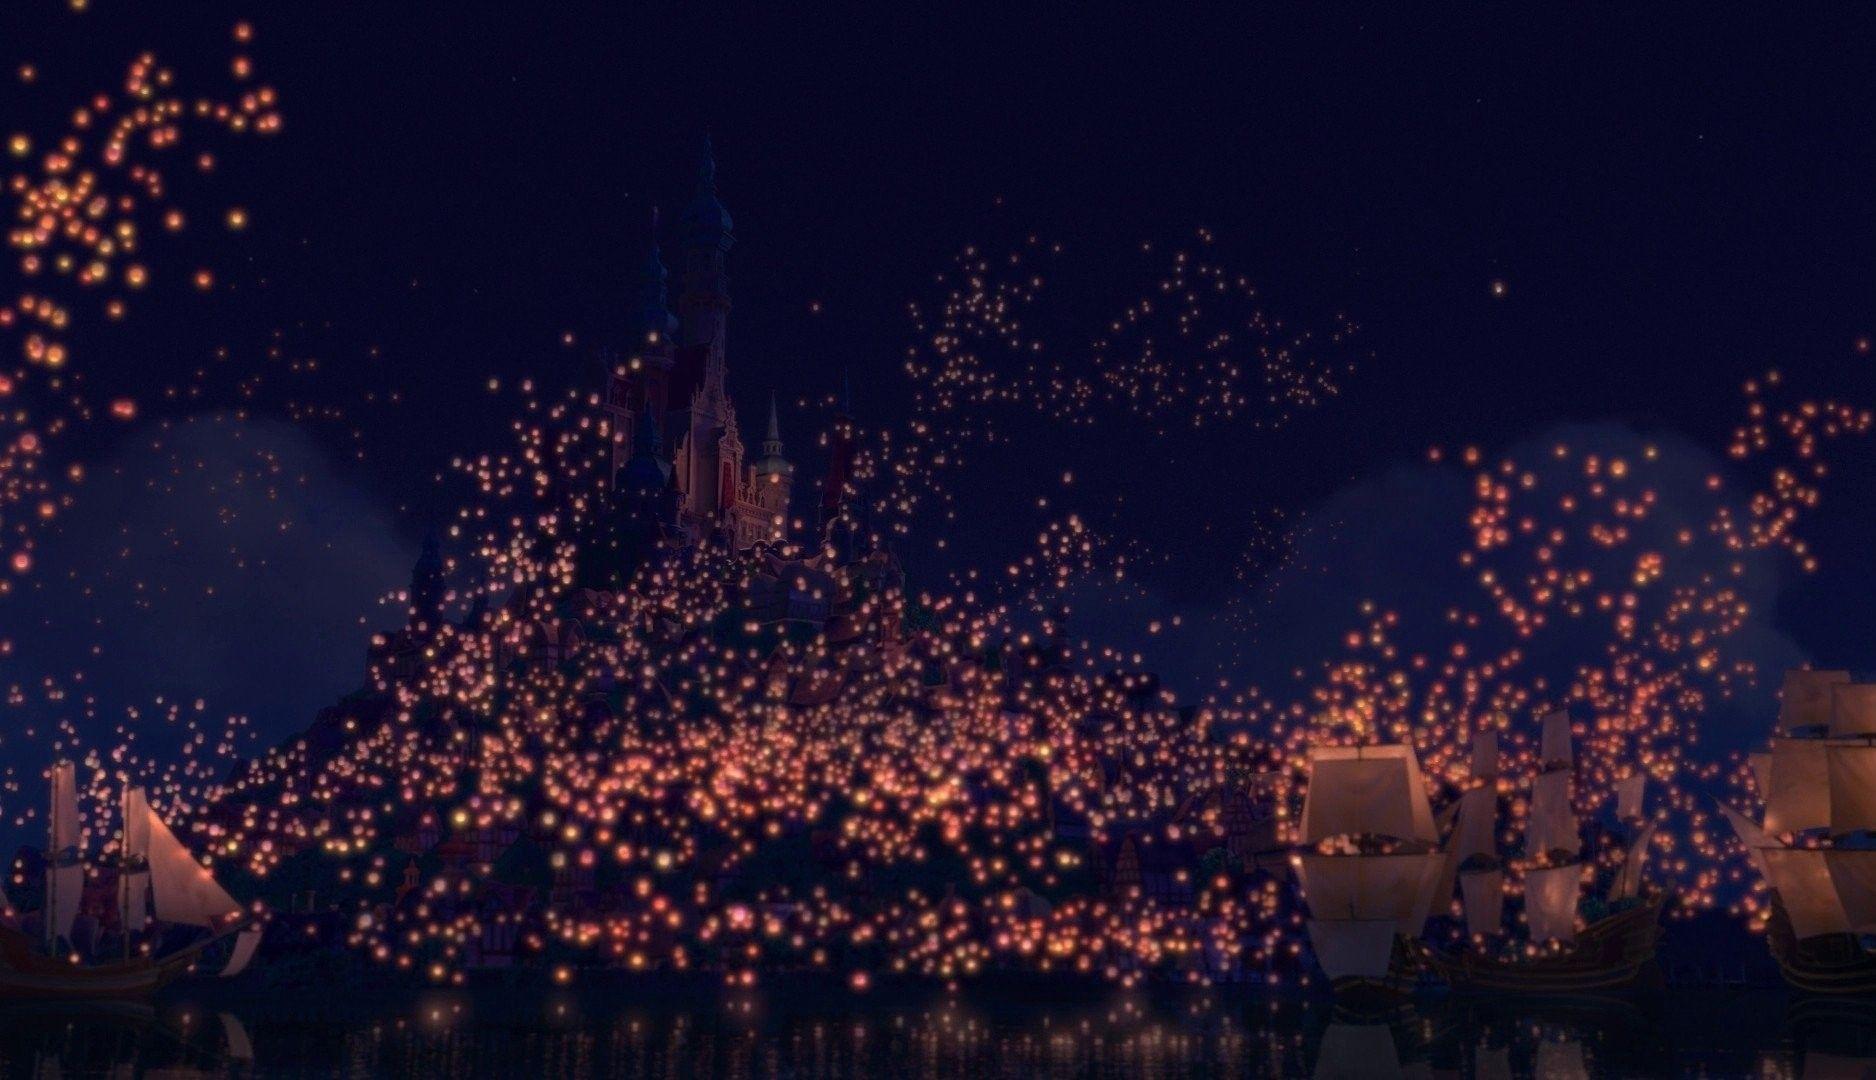 Aesthetic Disney Desktop Wallpapers Top Free Aesthetic Disney Desktop Backgrounds Wallpaperaccess